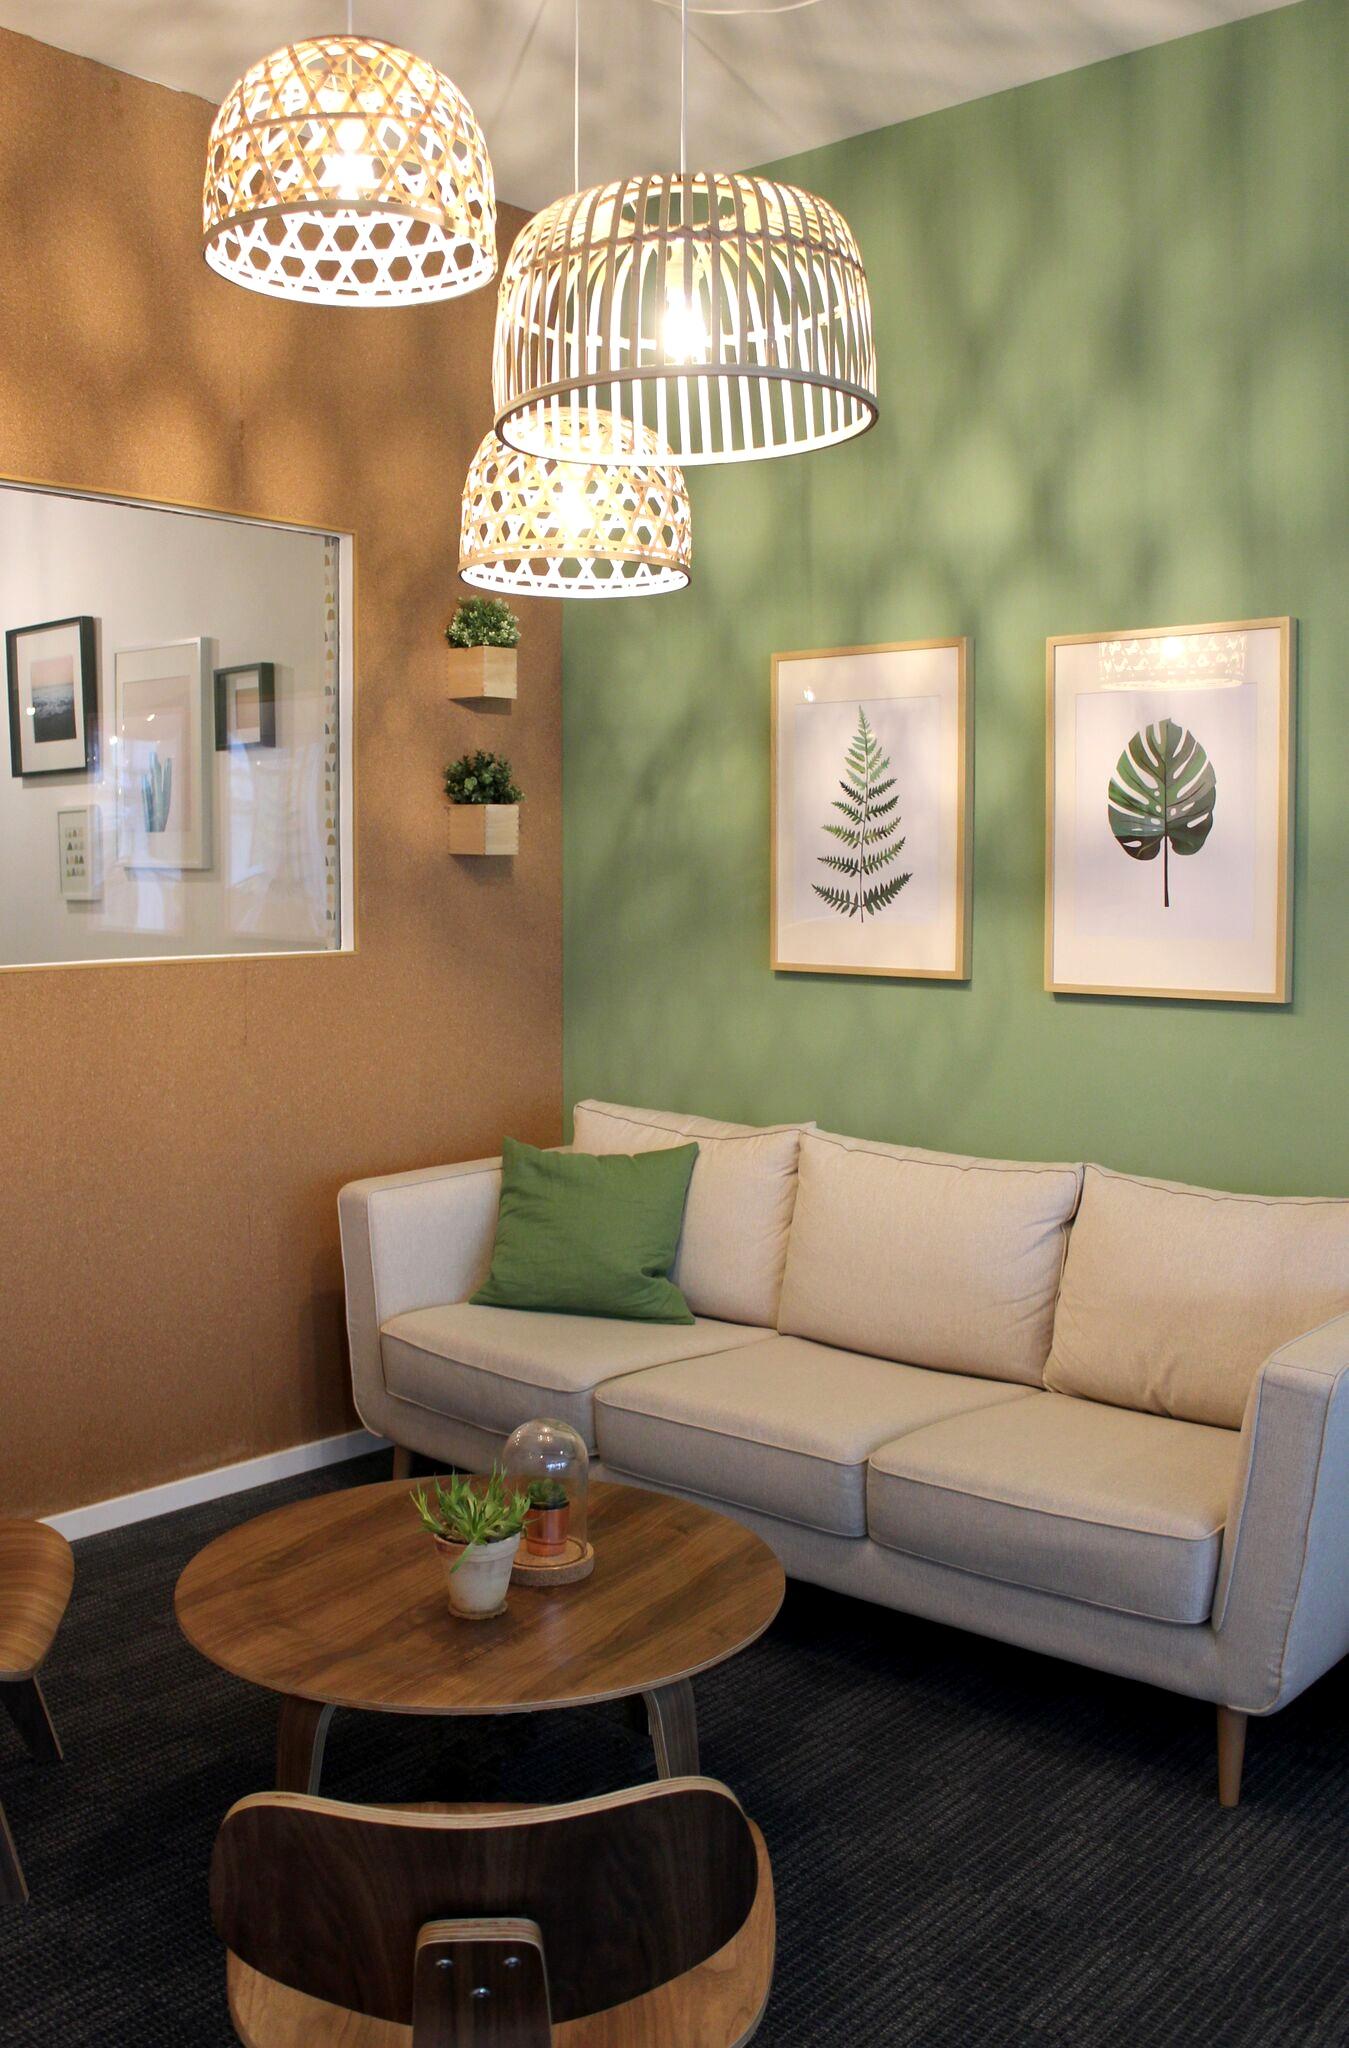 uberall_couchroom.jpg